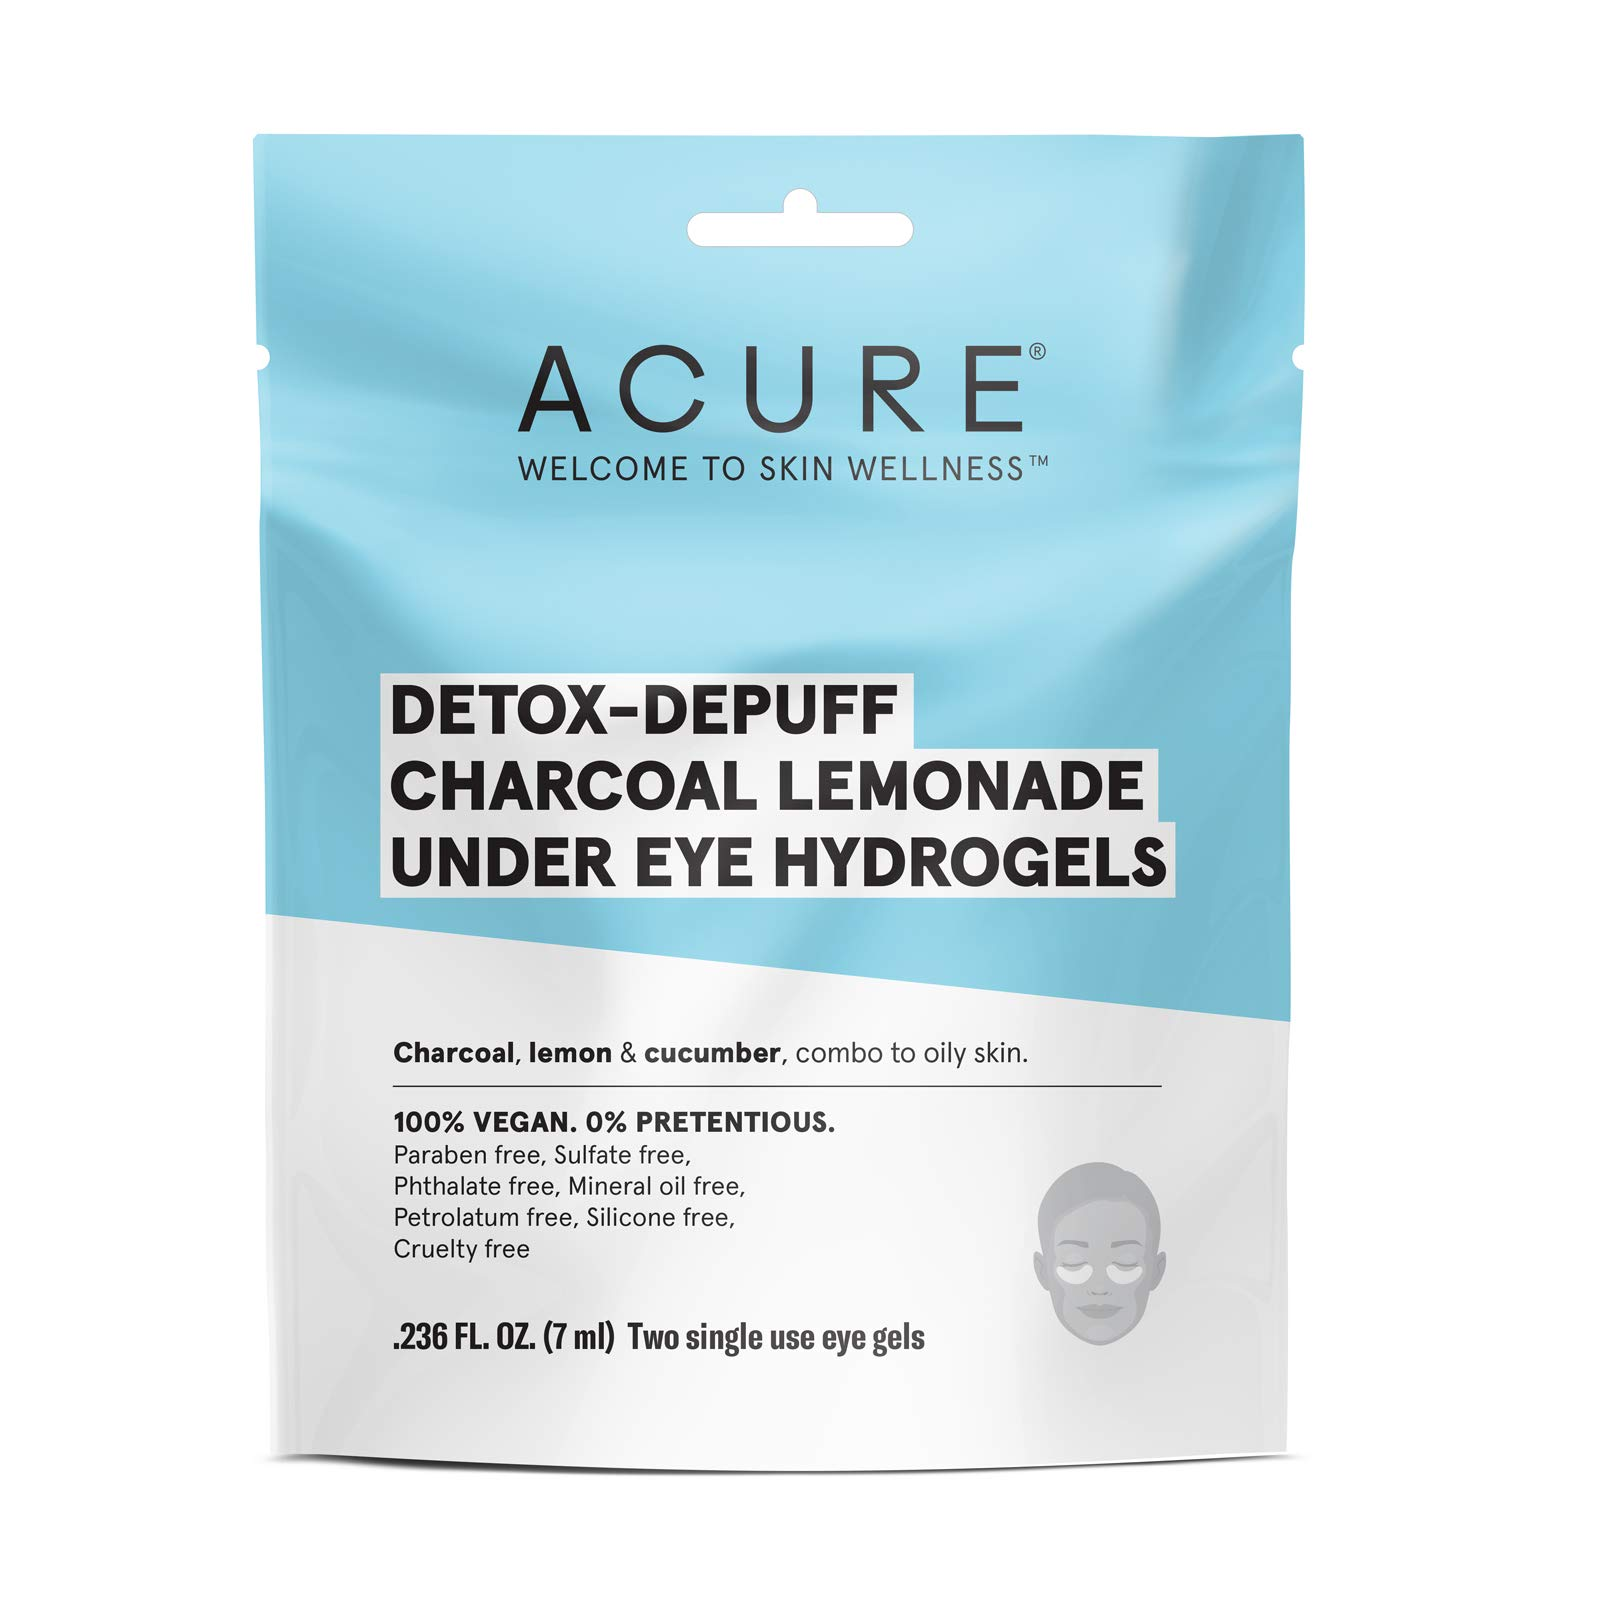 Acure Detox-Depuff Charcoal Lemonade Under Eye Hydrogels, 12 Count